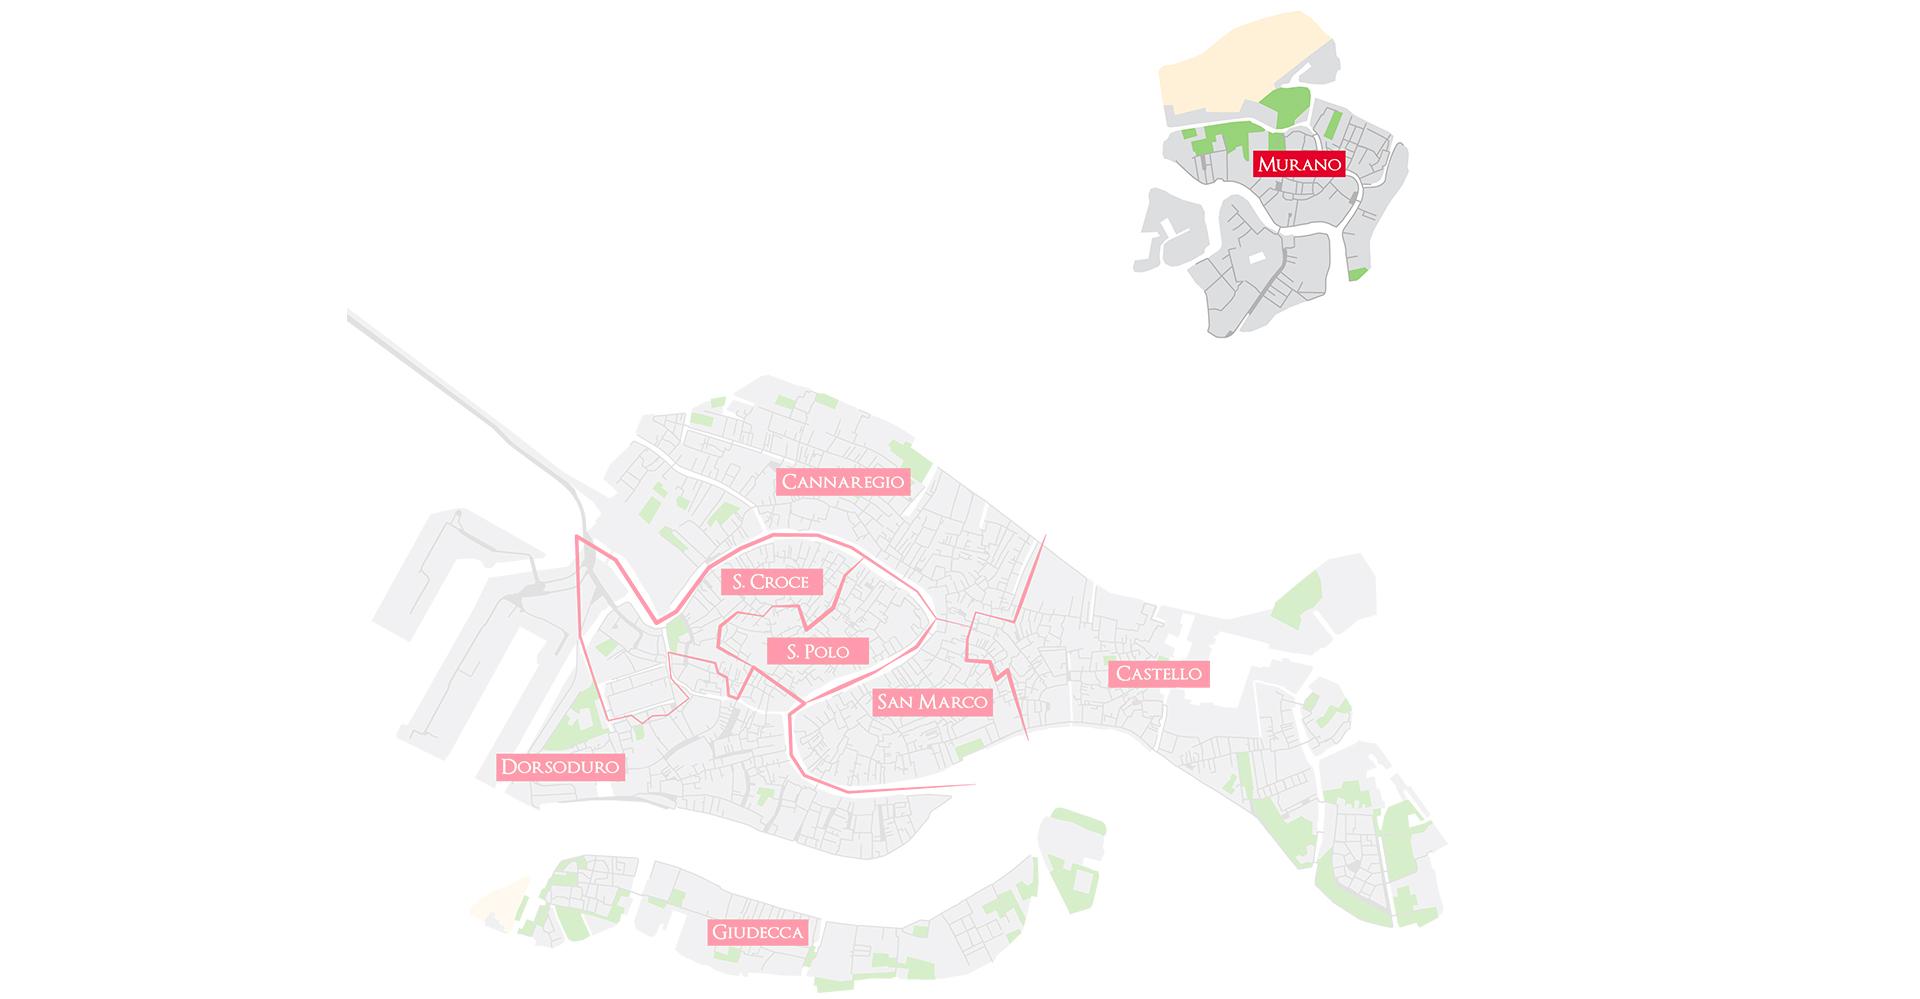 Bacaro Tour Venezia - Map sestieri - Murano